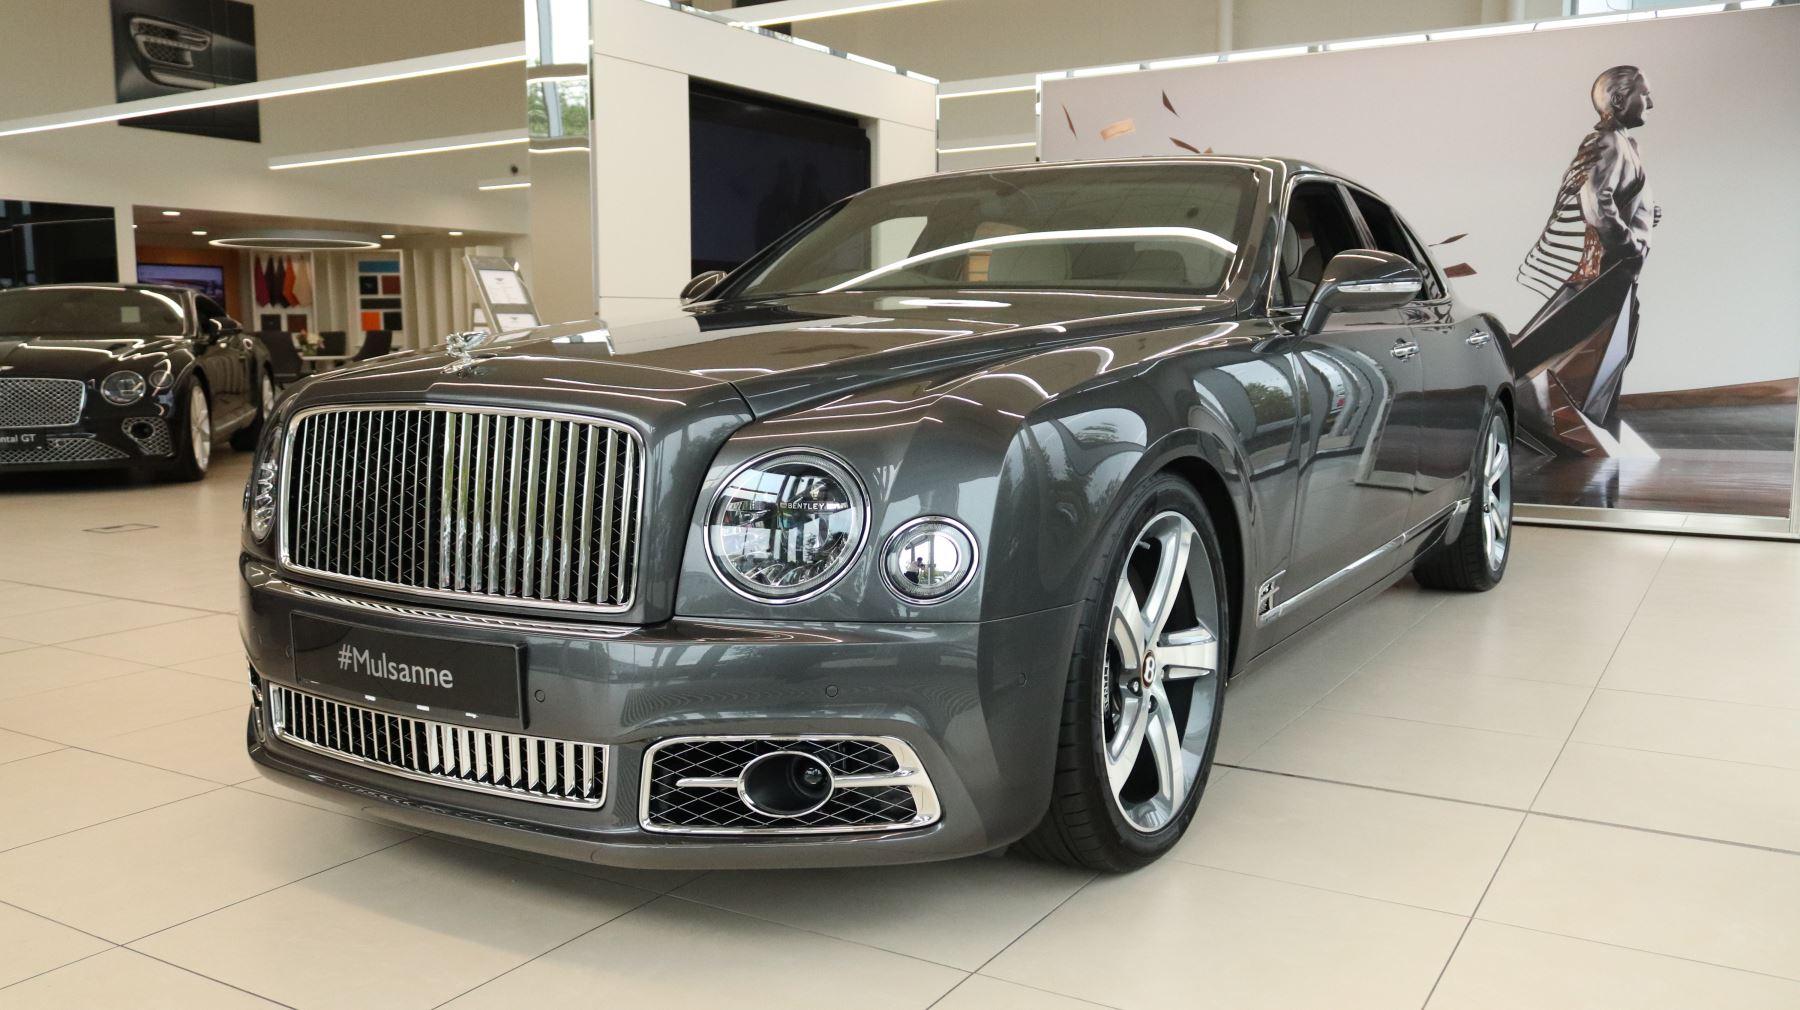 Bentley Mulsanne Speed 6.8 V8 Speed Auto Automatic 4 door Saloon (2019) image